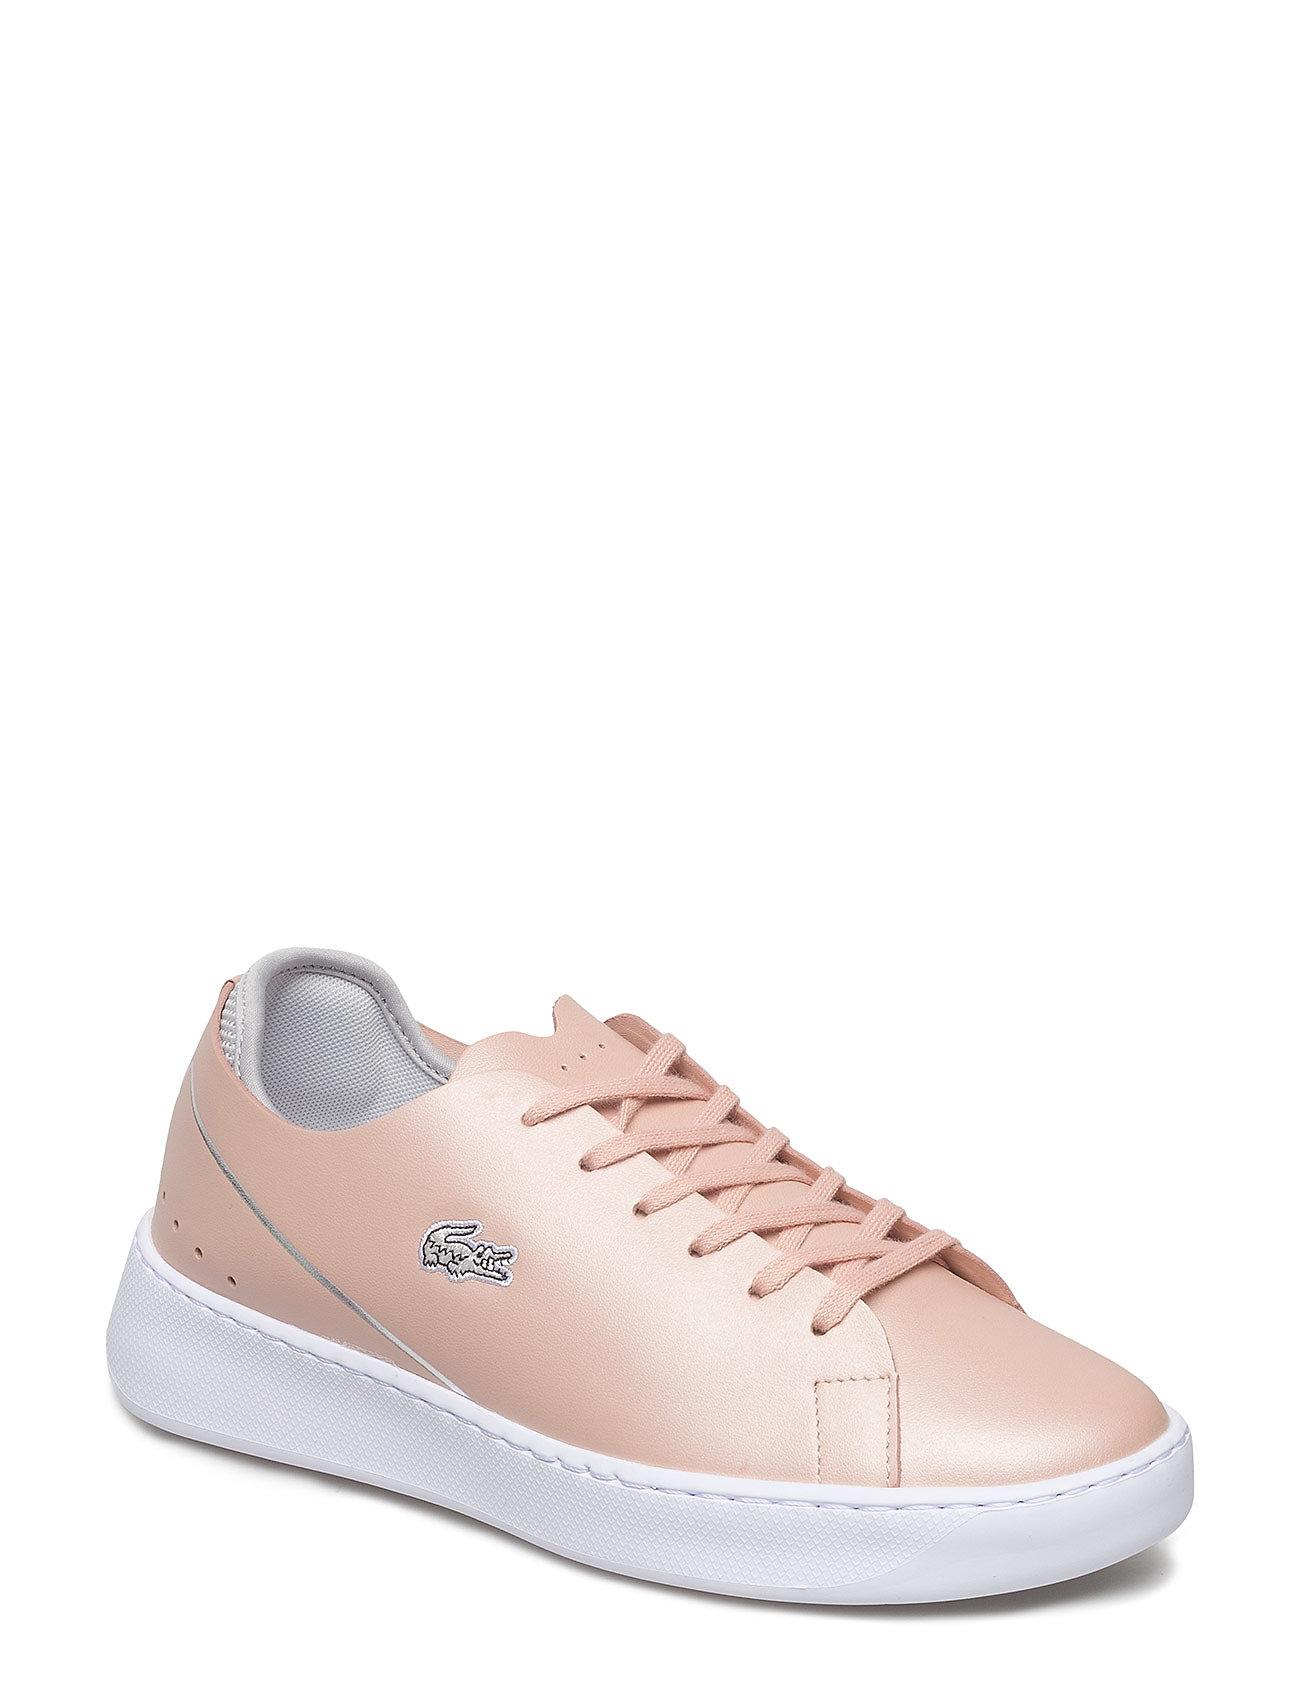 256373174f49 Lacoste Shoes Eyyla 118 1 (Nat lt Gry Lth)